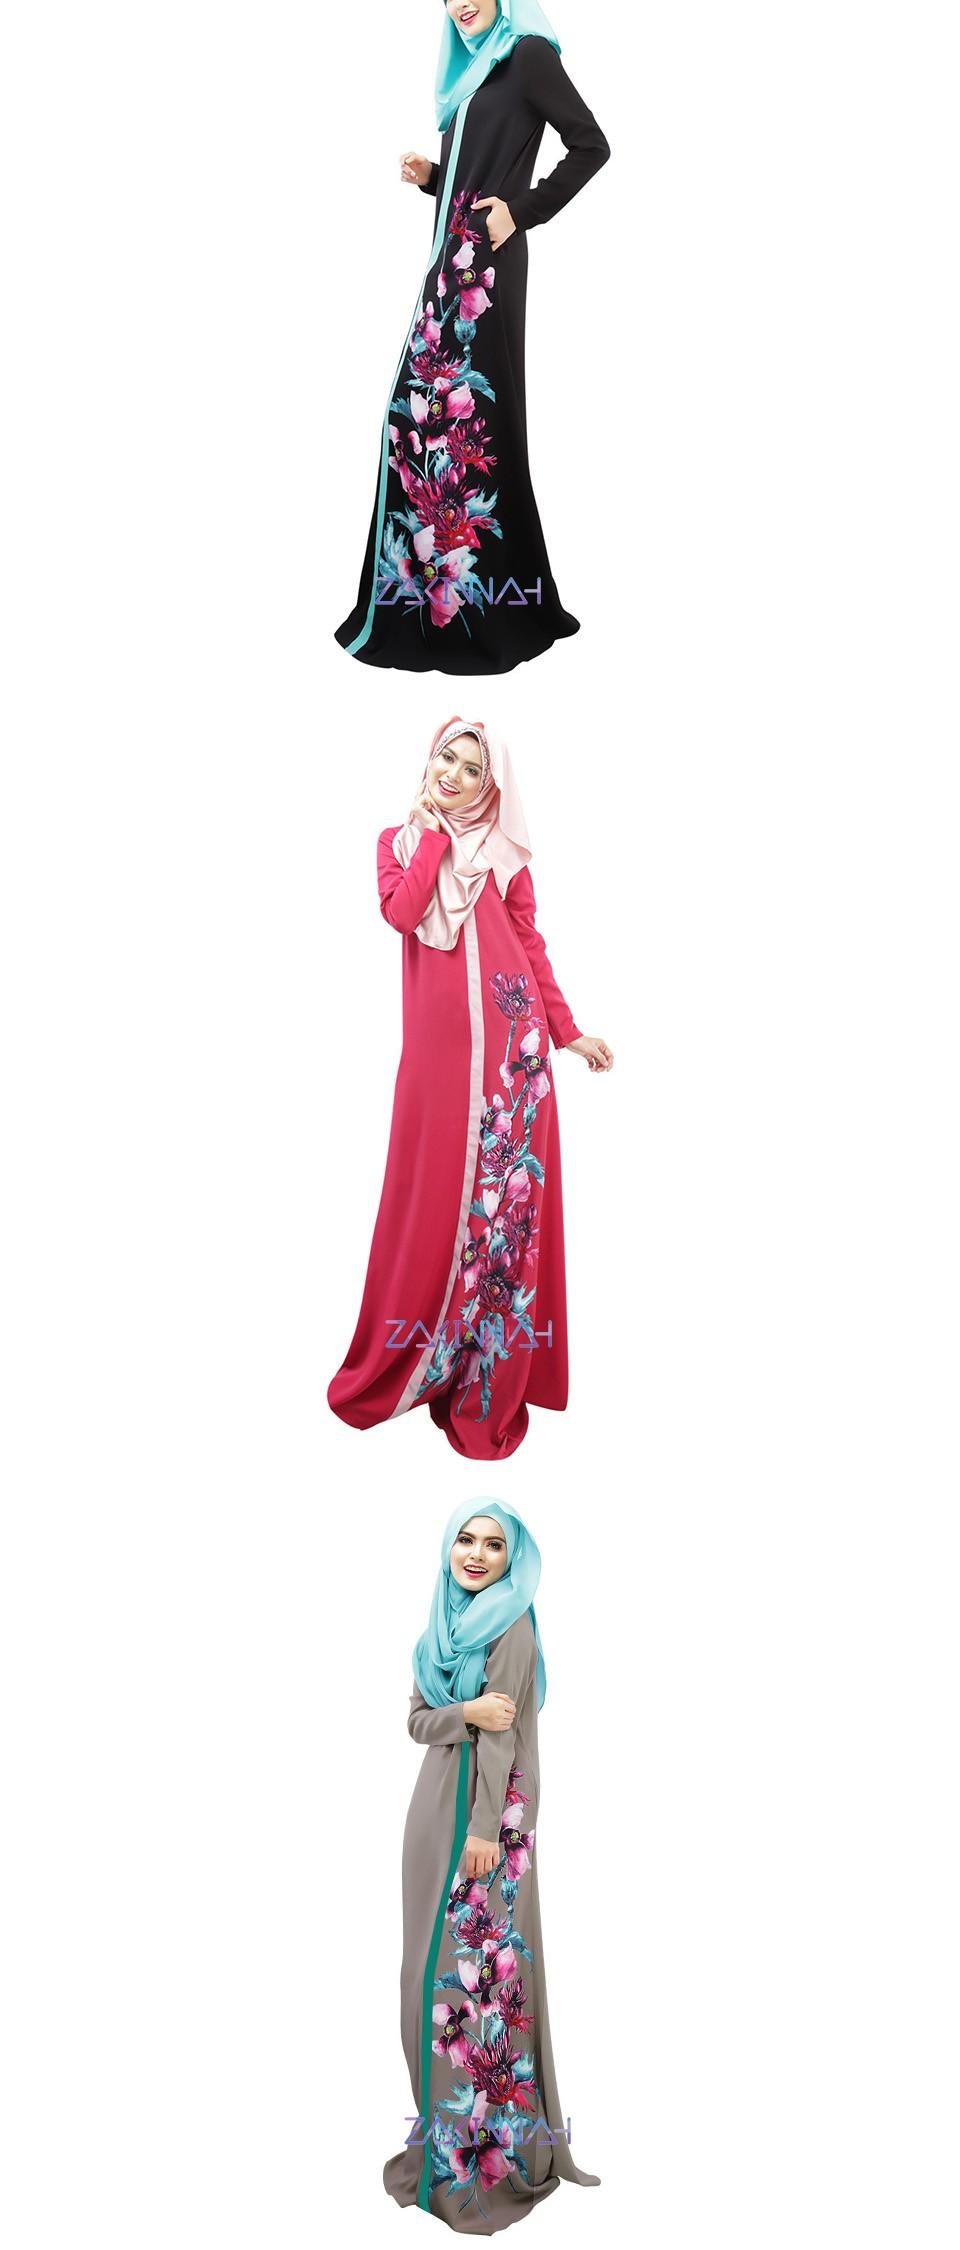 026 New Style In Dubai Women Flower Print Robe Spliced Muslim Anneyep Printed Flowers Kaftan Maxi Dress Xxldress Length 141 Sleeves 61 Shoulder 40 Bust 106 Waist 92 Hip Cm